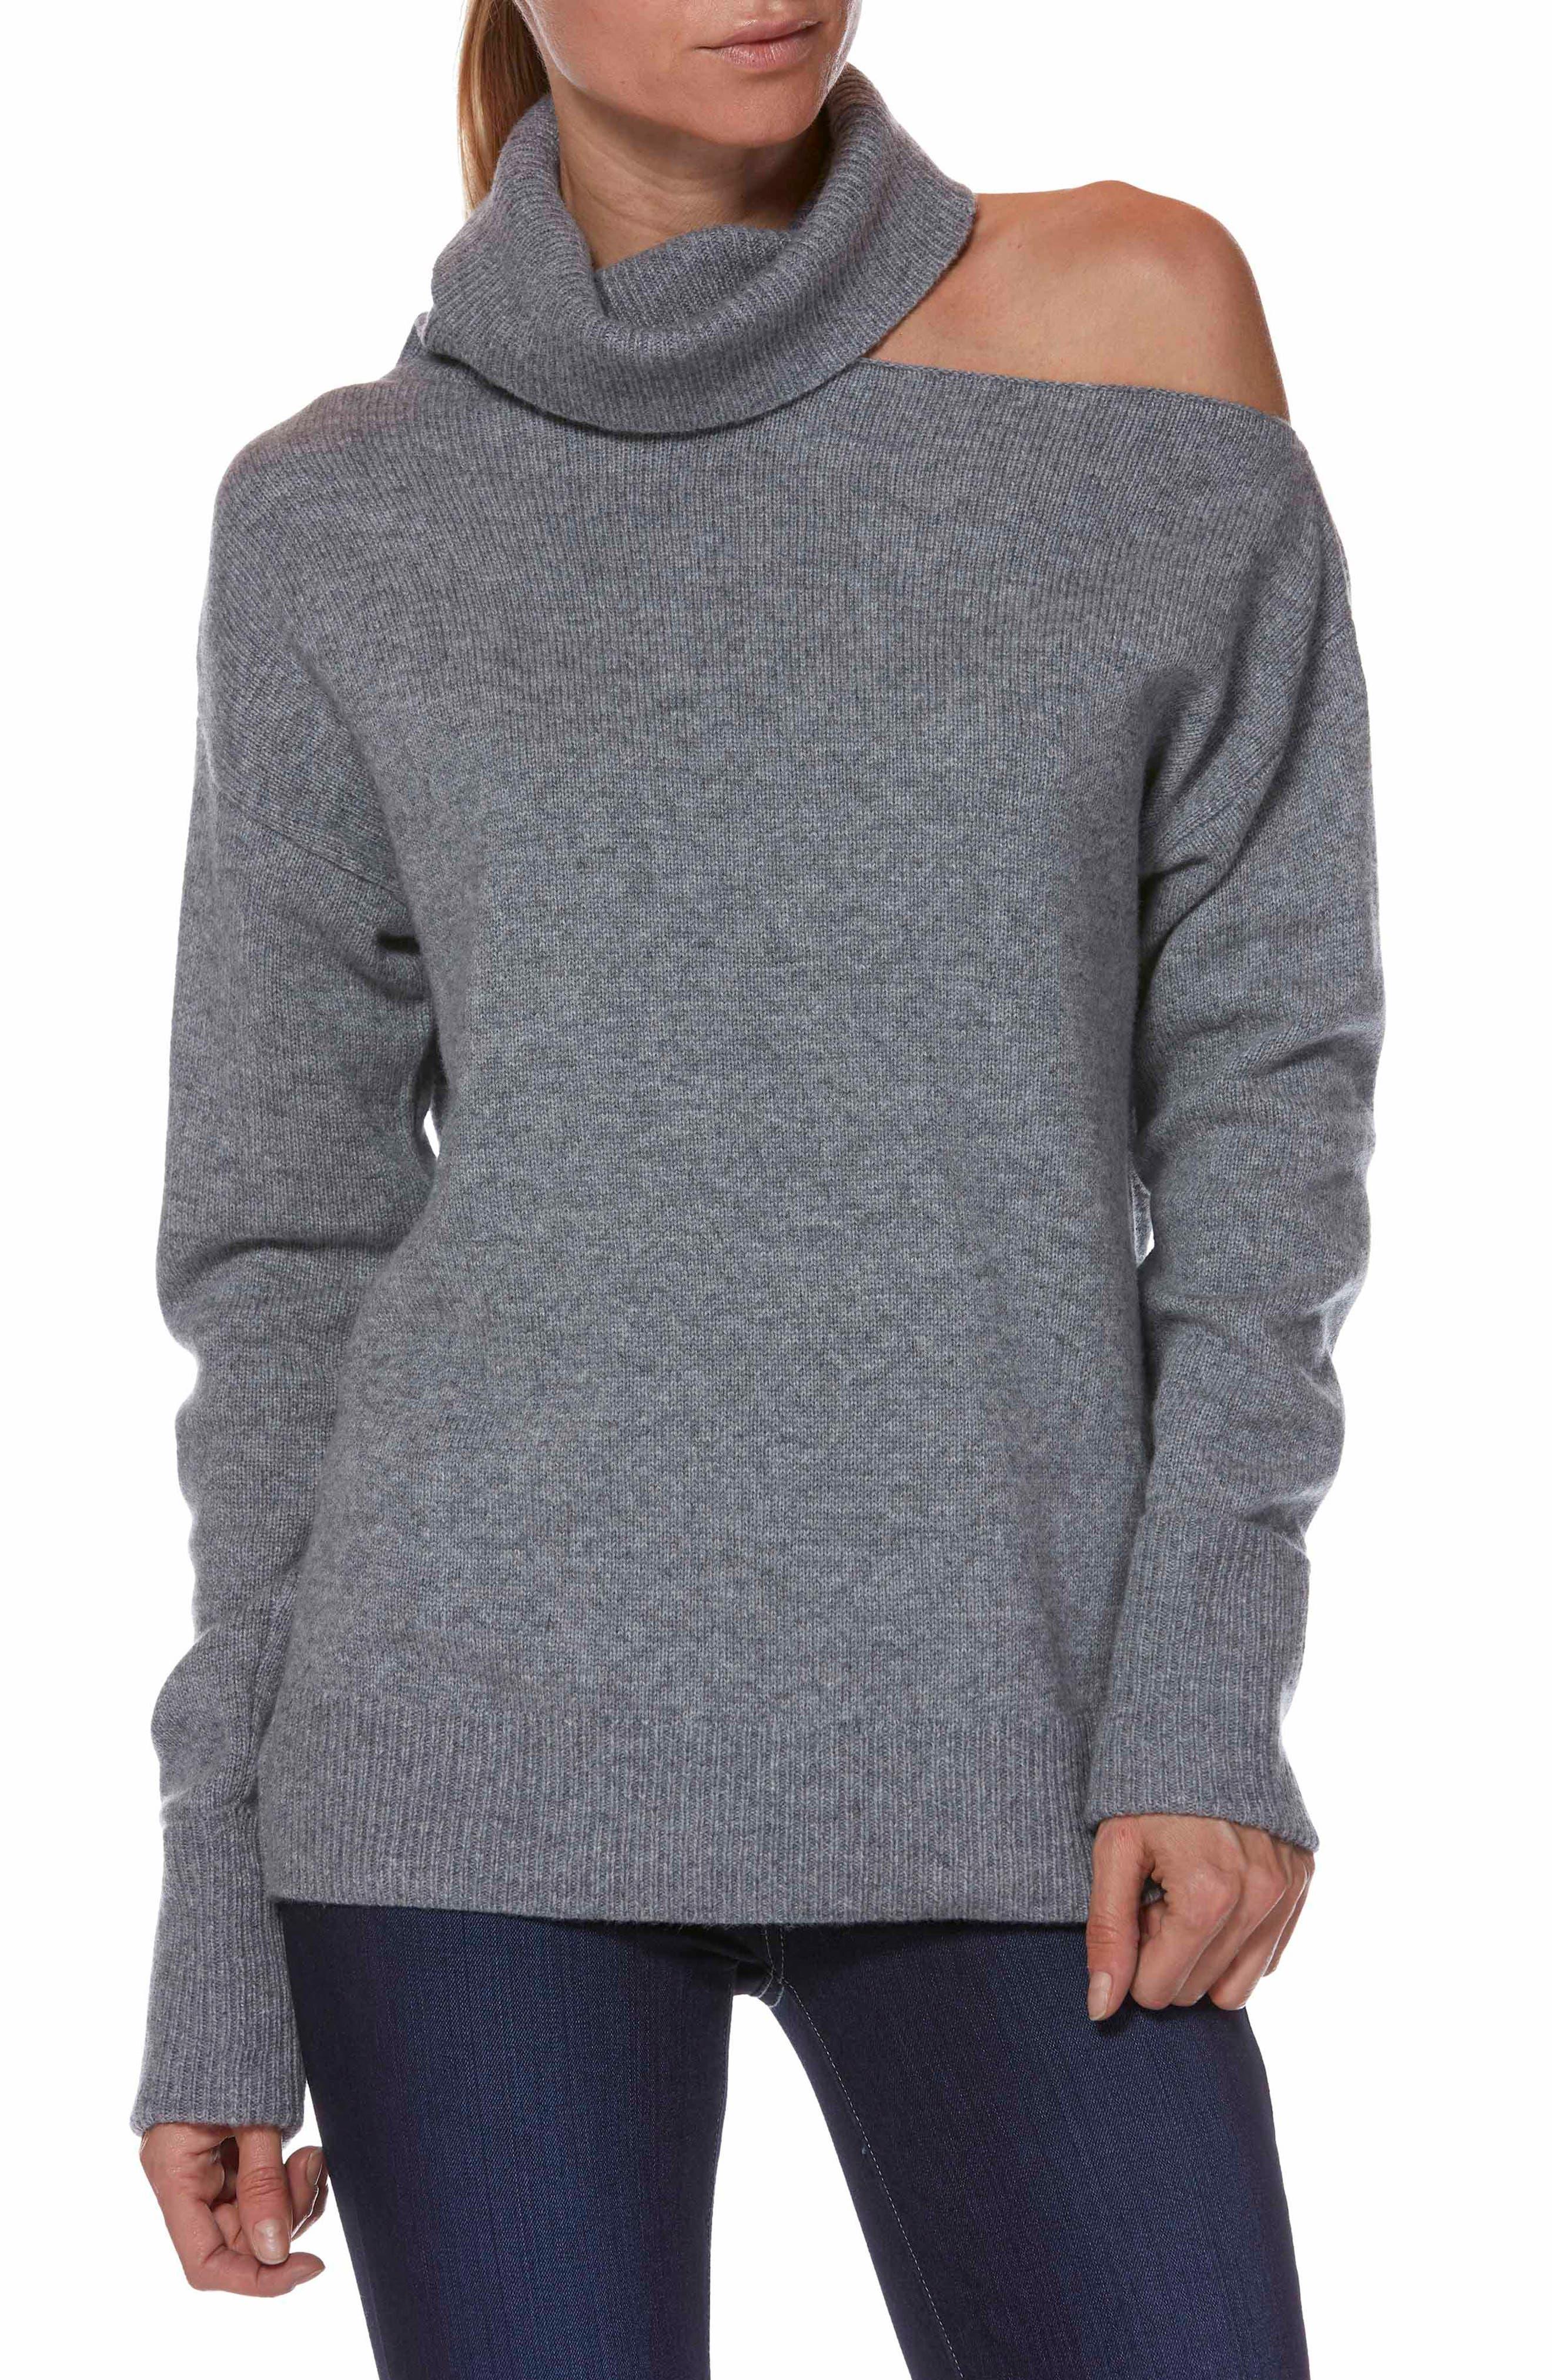 Raundi Cutout Shoulder Sweater,                         Main,                         color, HEATHER GREY